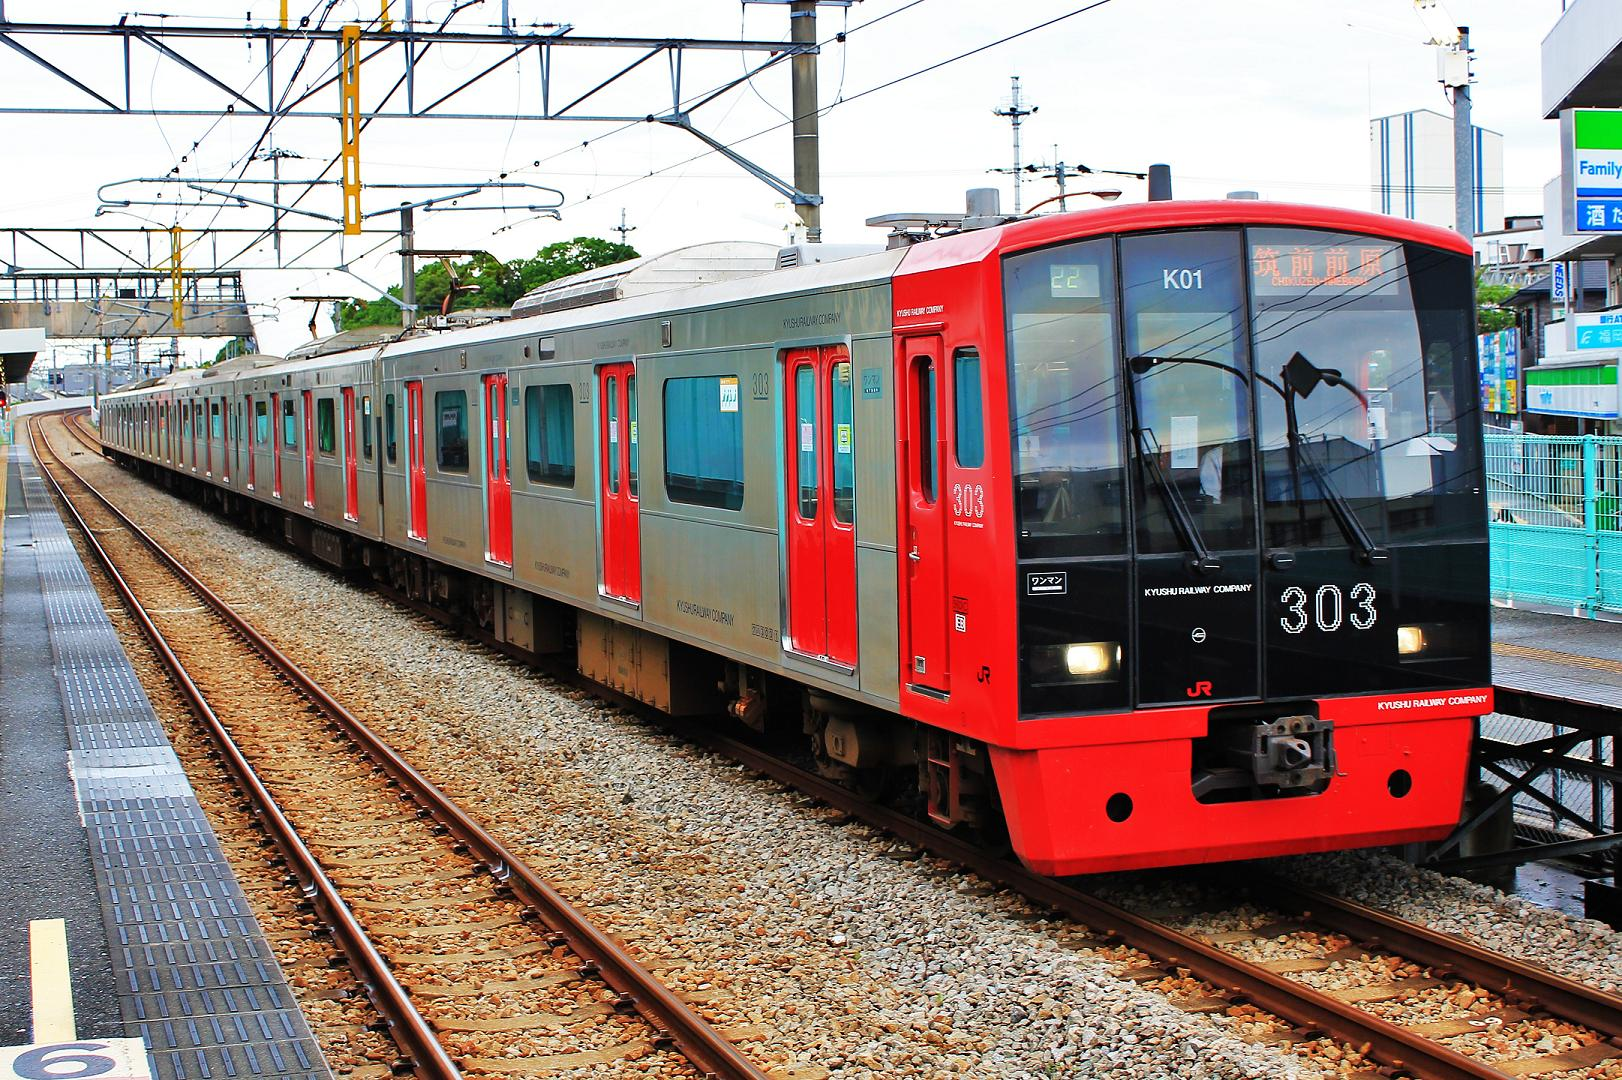 Jr九州: JR九州 303系 0番代/K01編成 : 鉄道撮影日記2014